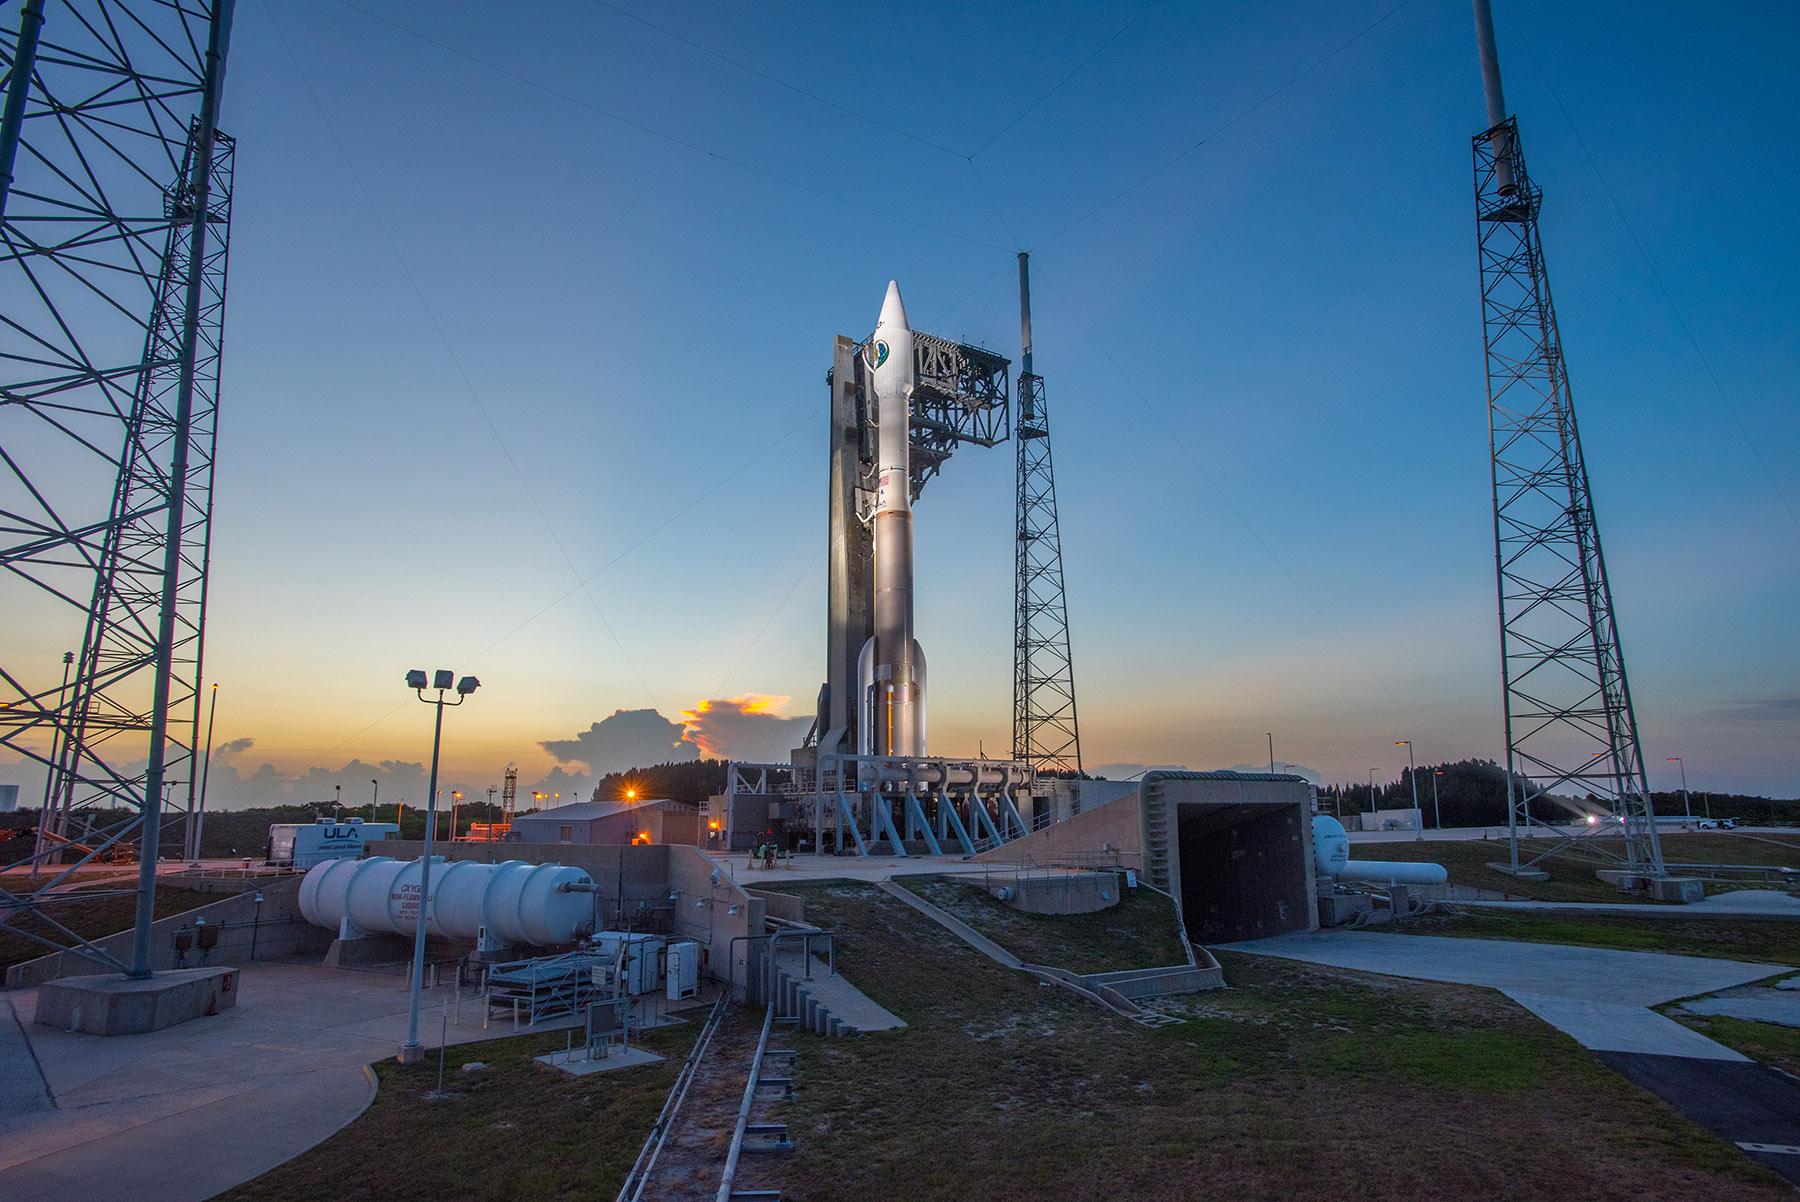 SPACE WEBCASTS: Liftoff! Atlas V Rocket Launches NROL-61 Spy Satellite